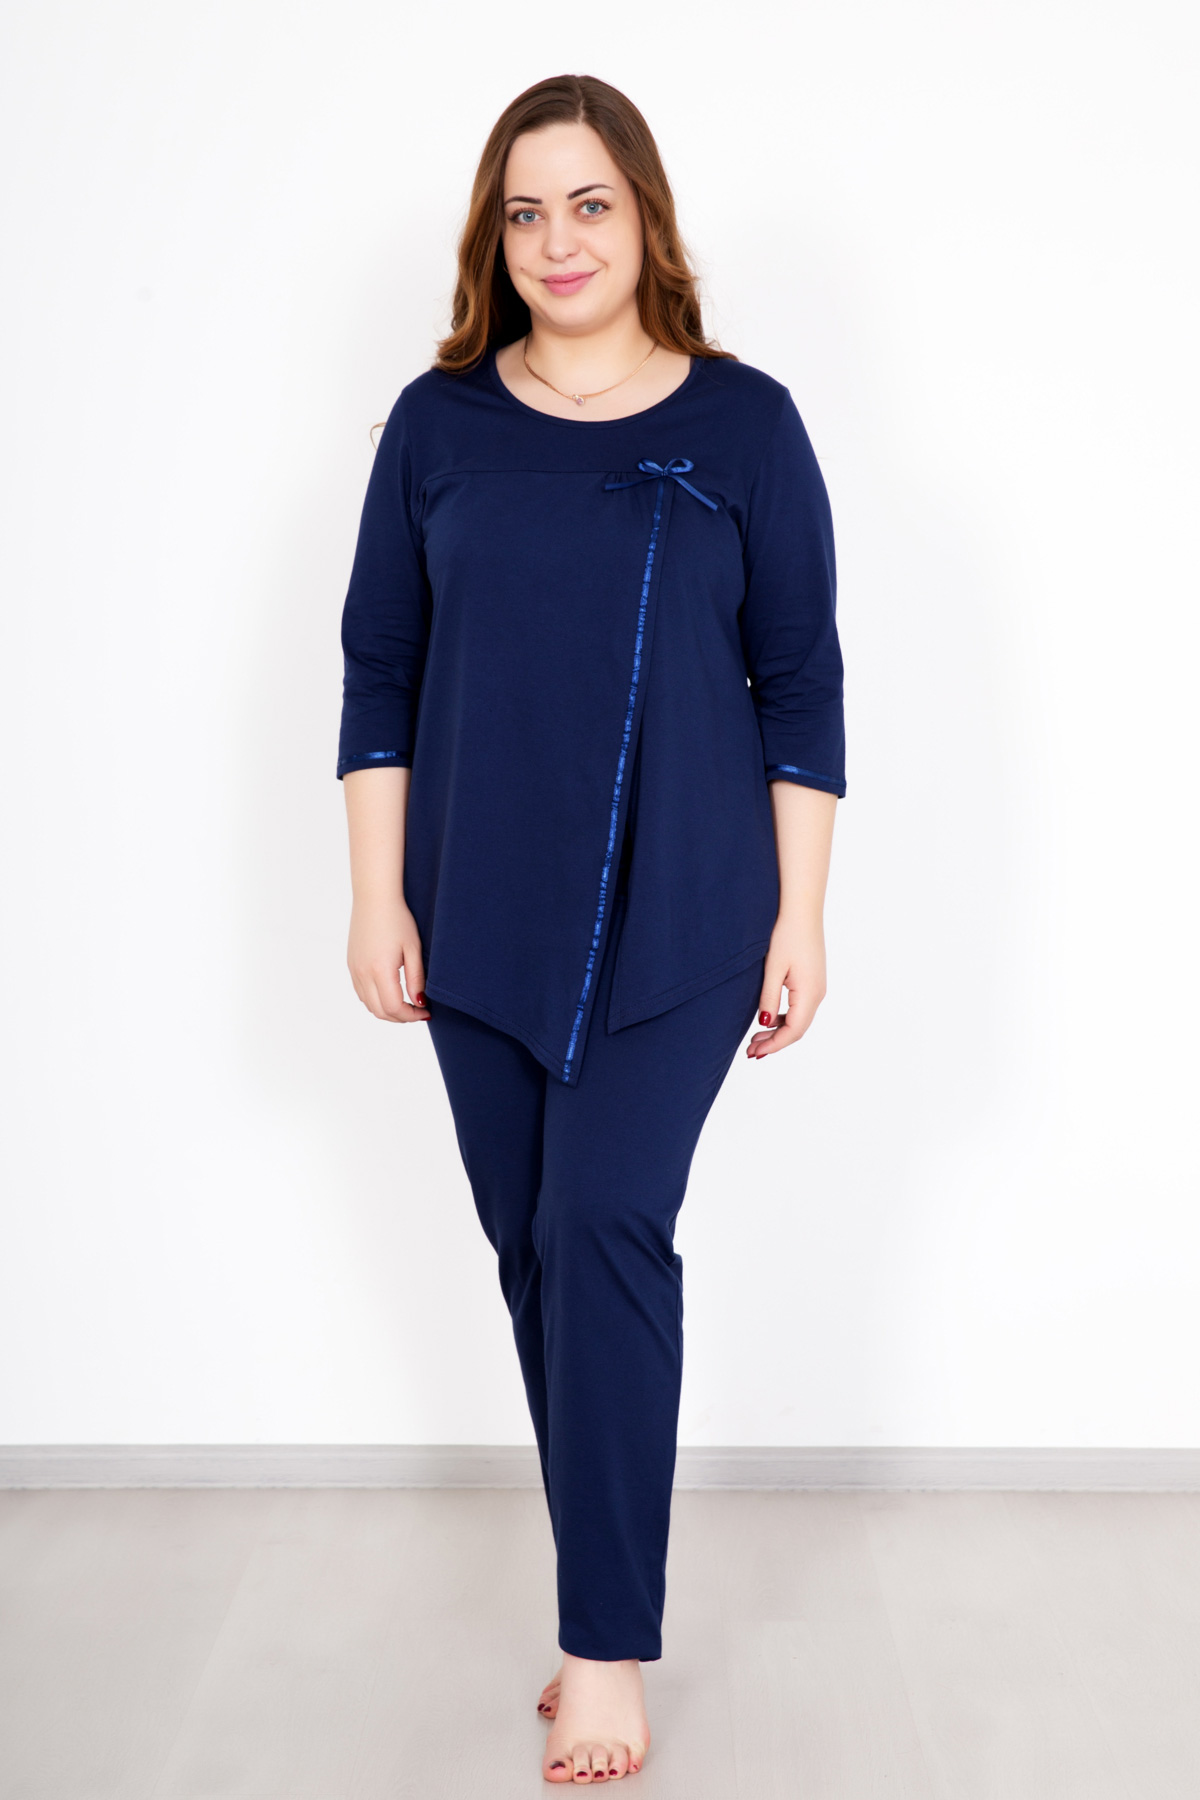 Жен. костюм  Катарина  Синий р. 60 - Текстиль для здоровья артикул: 33442